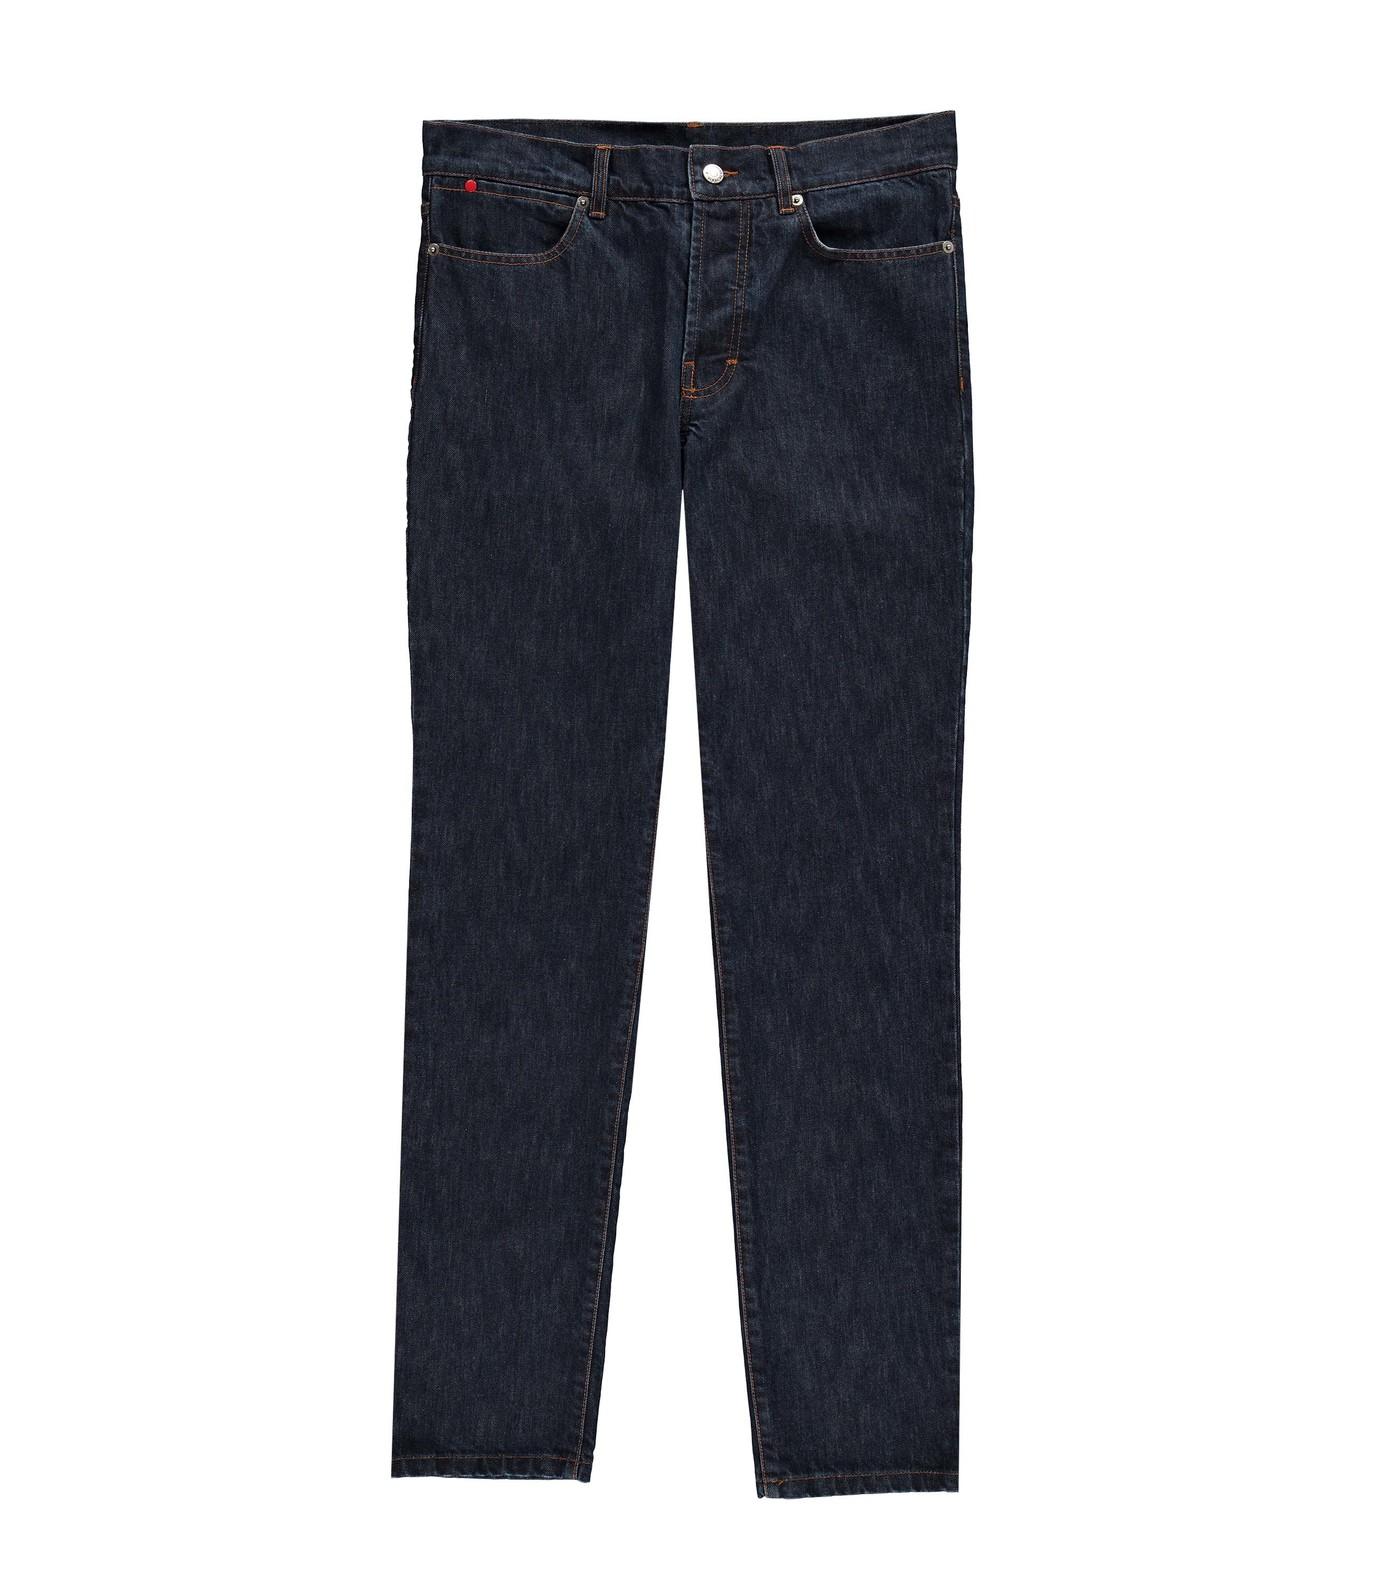 Pants GN.DENIM - Stone wash